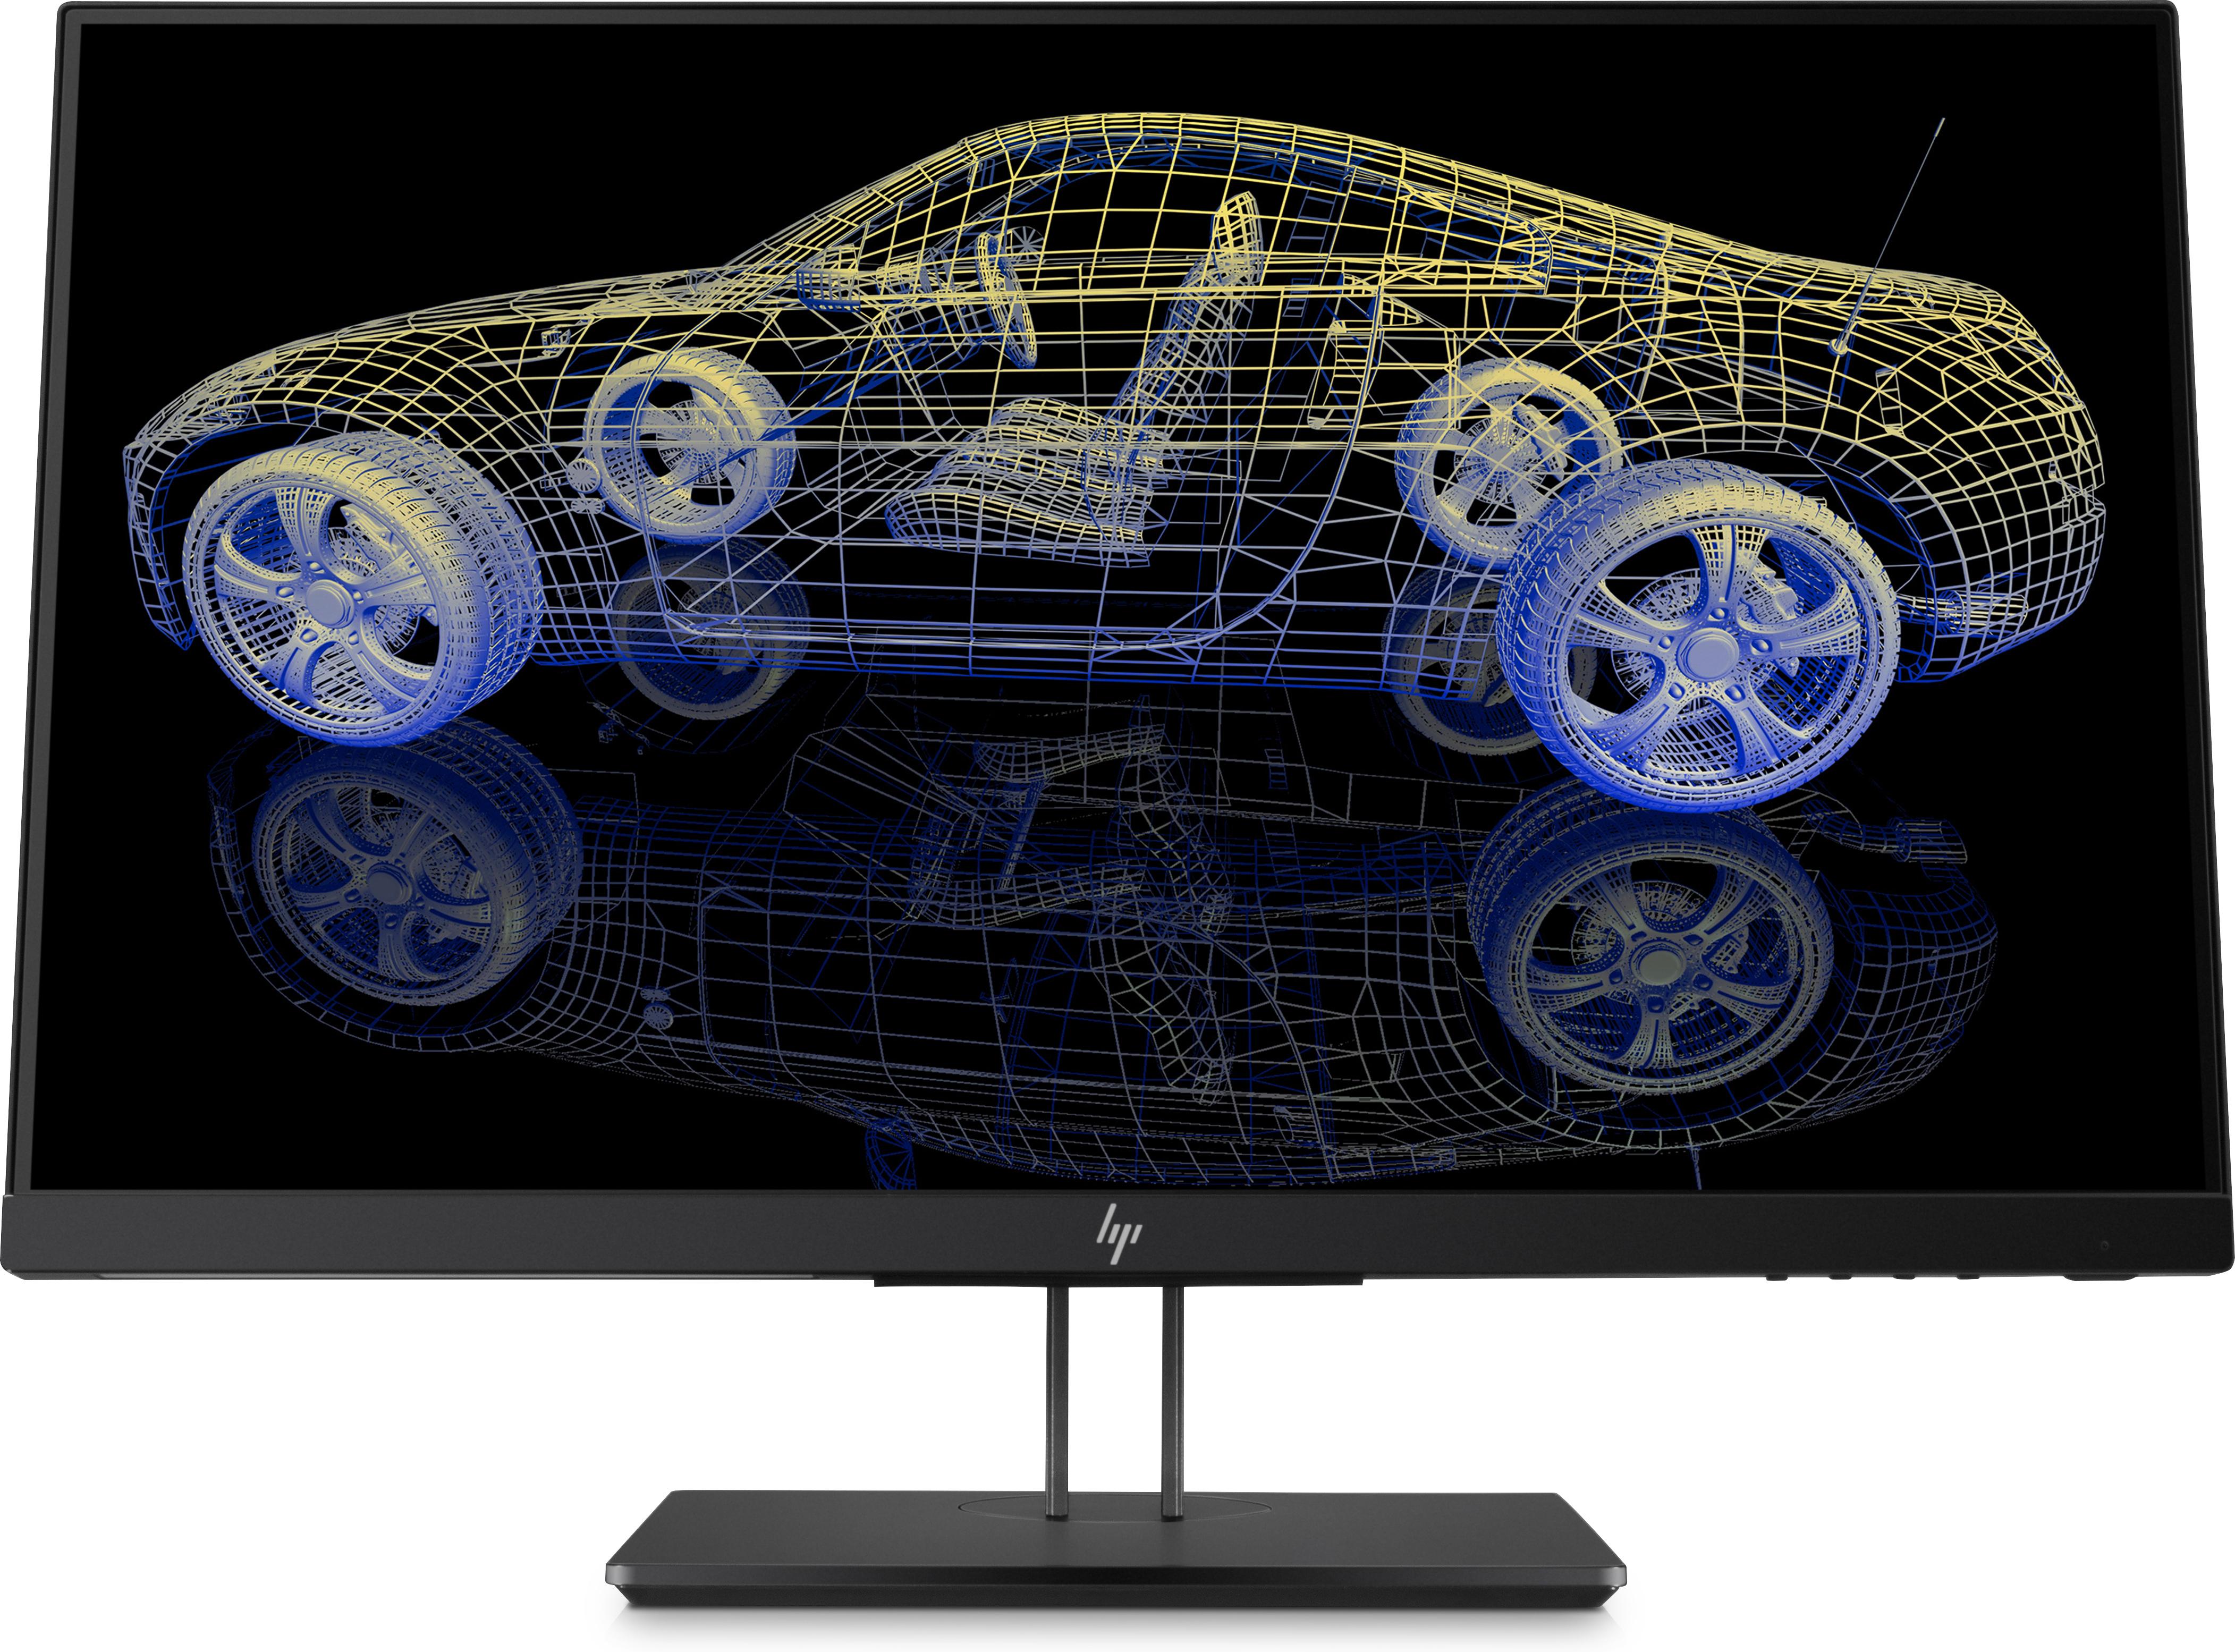 HP Z23n G2 23Zoll Full HD IPS Schwarz Computerbildschirm